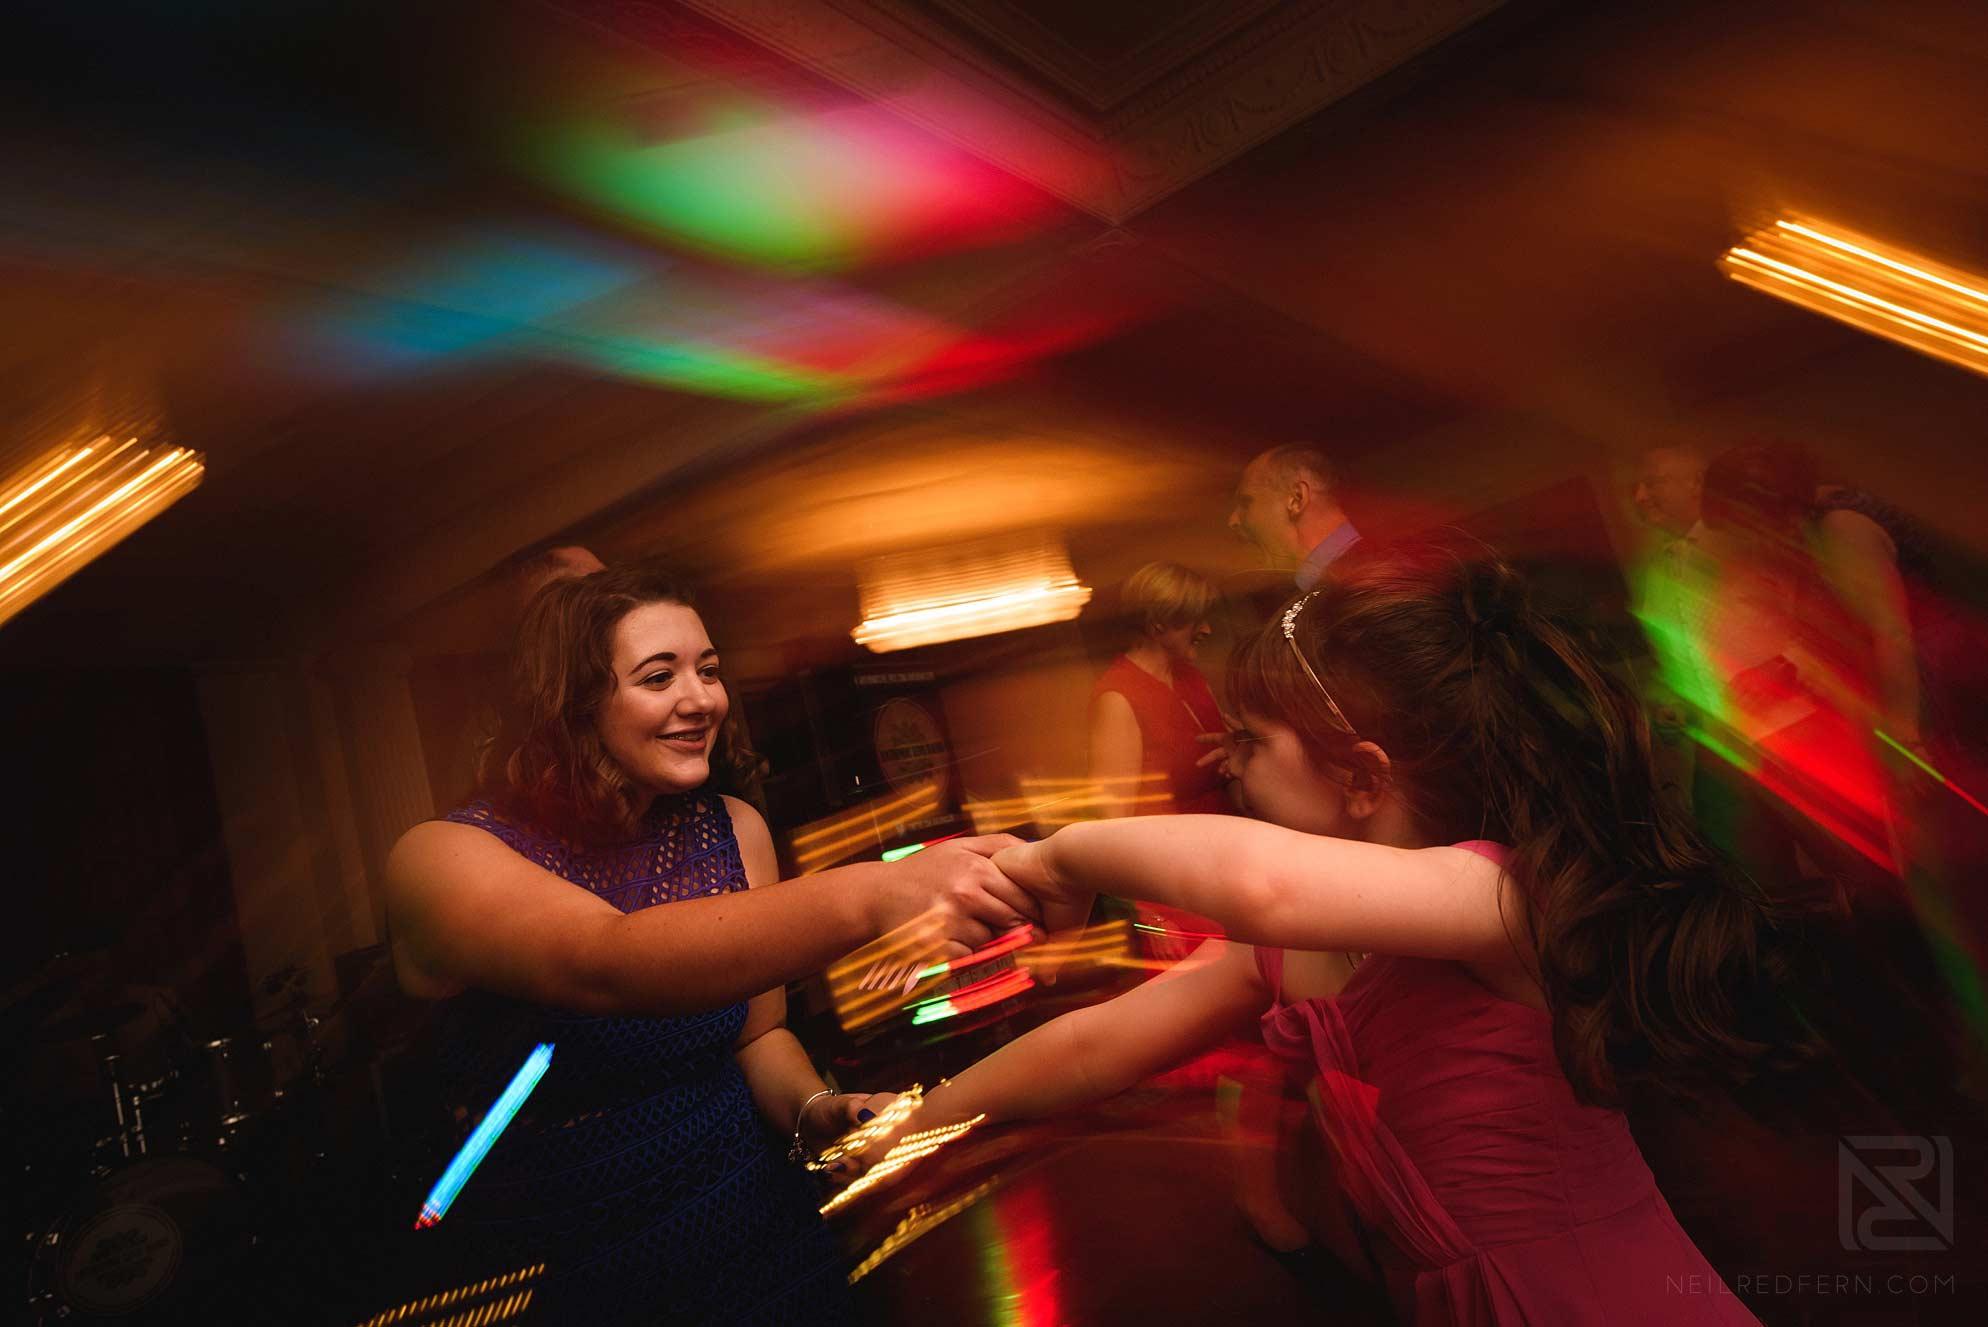 Metropole-Hotel-Llandrindod-Wells-wedding-37